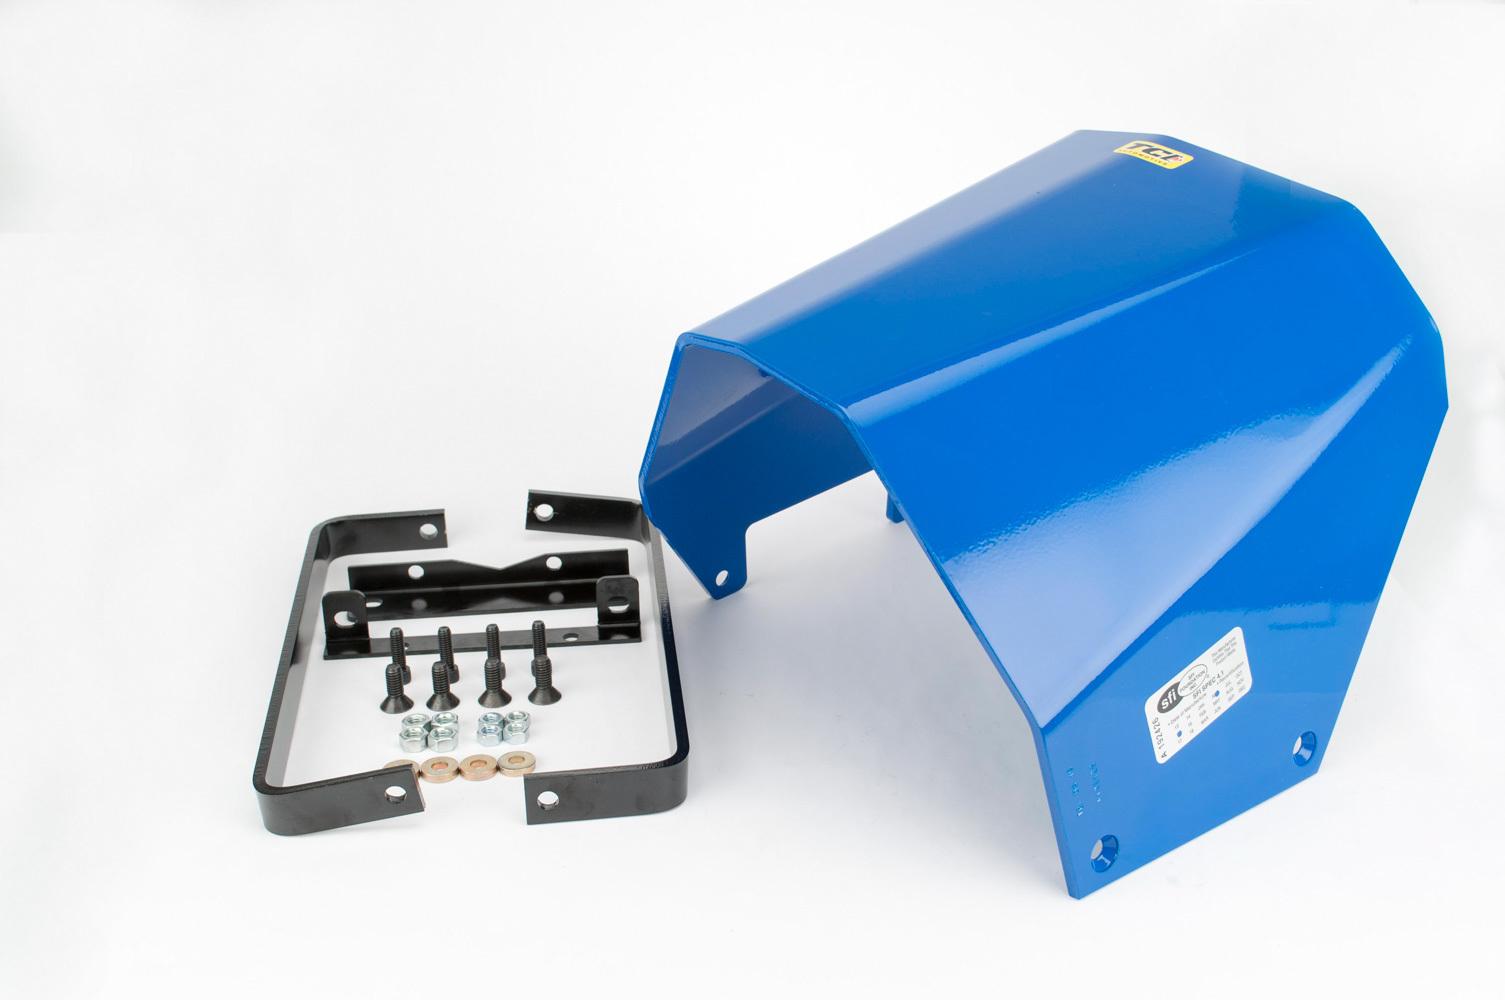 Tci Th400 Trans Shield (Blue